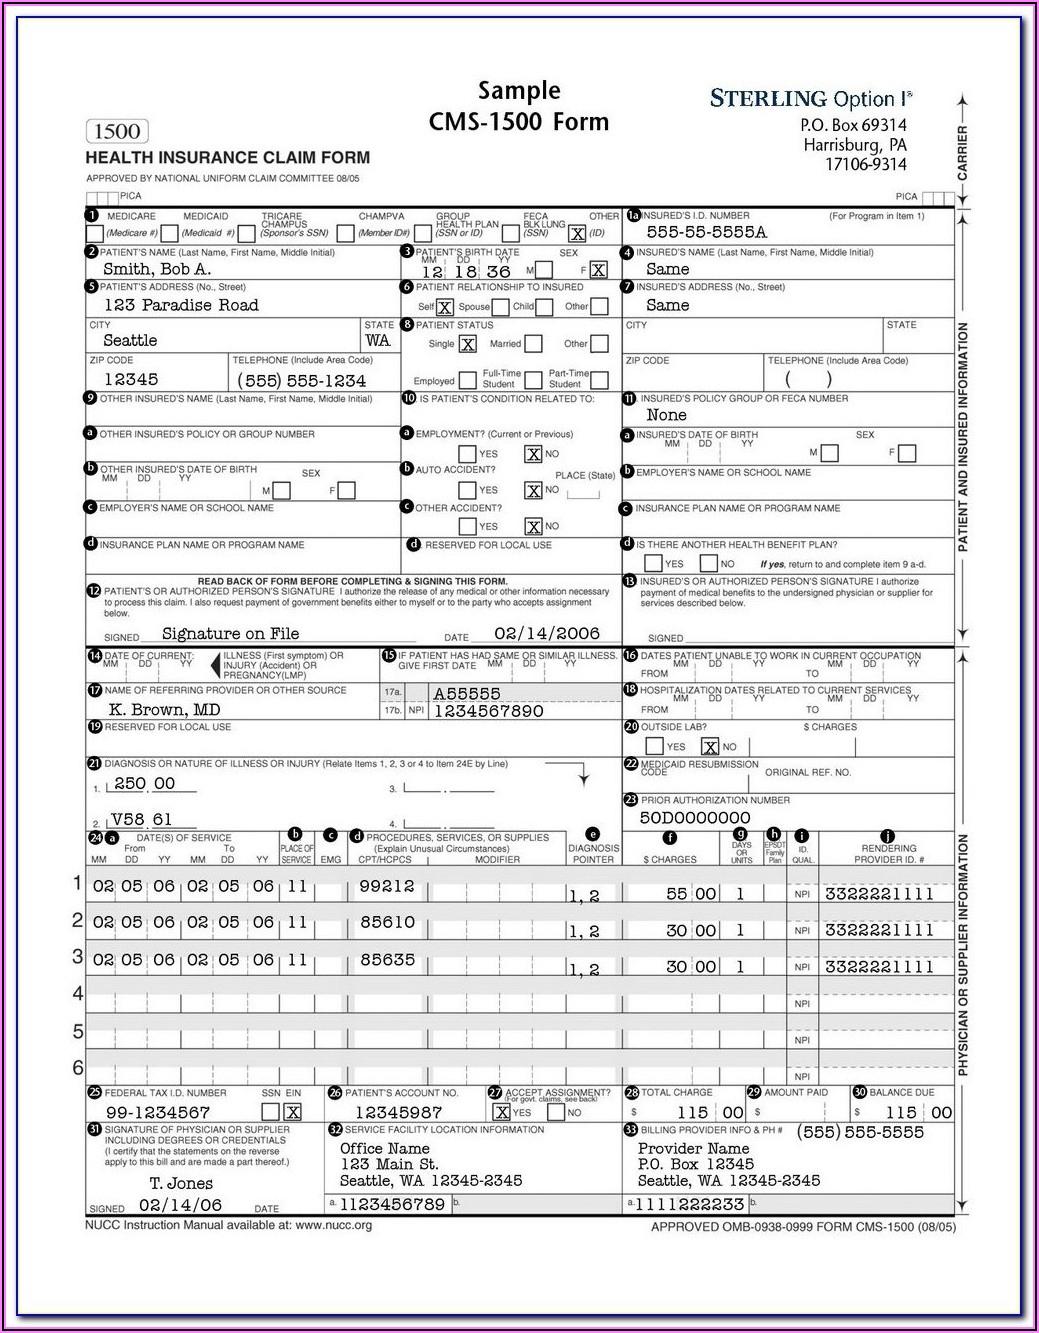 Health Insurance Claim Form Hcfa 1500